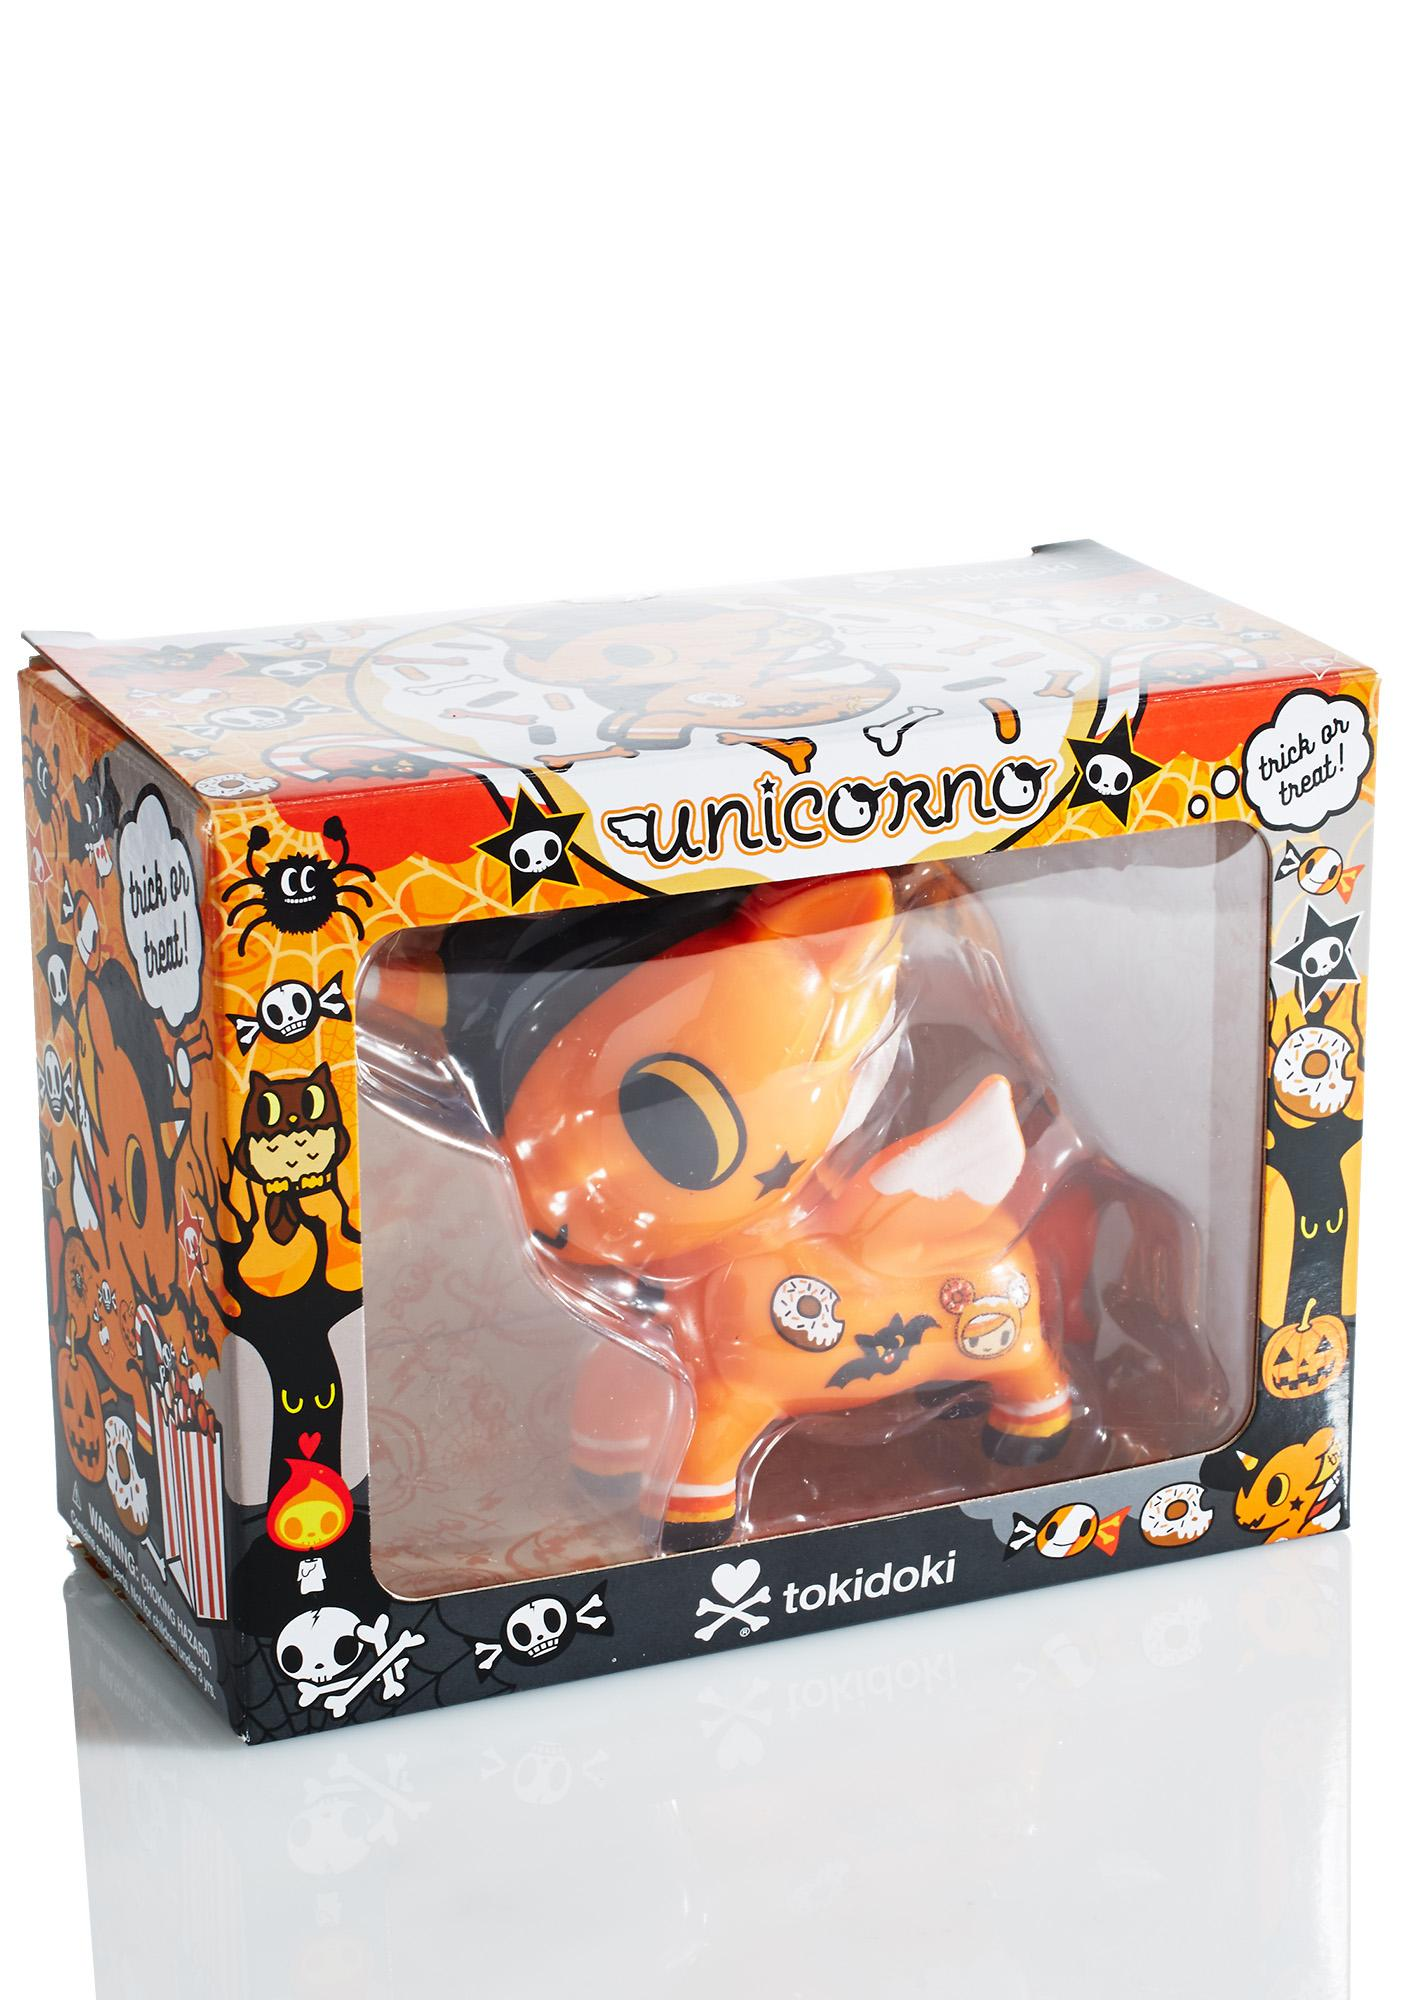 Tokidoki Halloween Unicorno 5 Inch Vinyl Figure